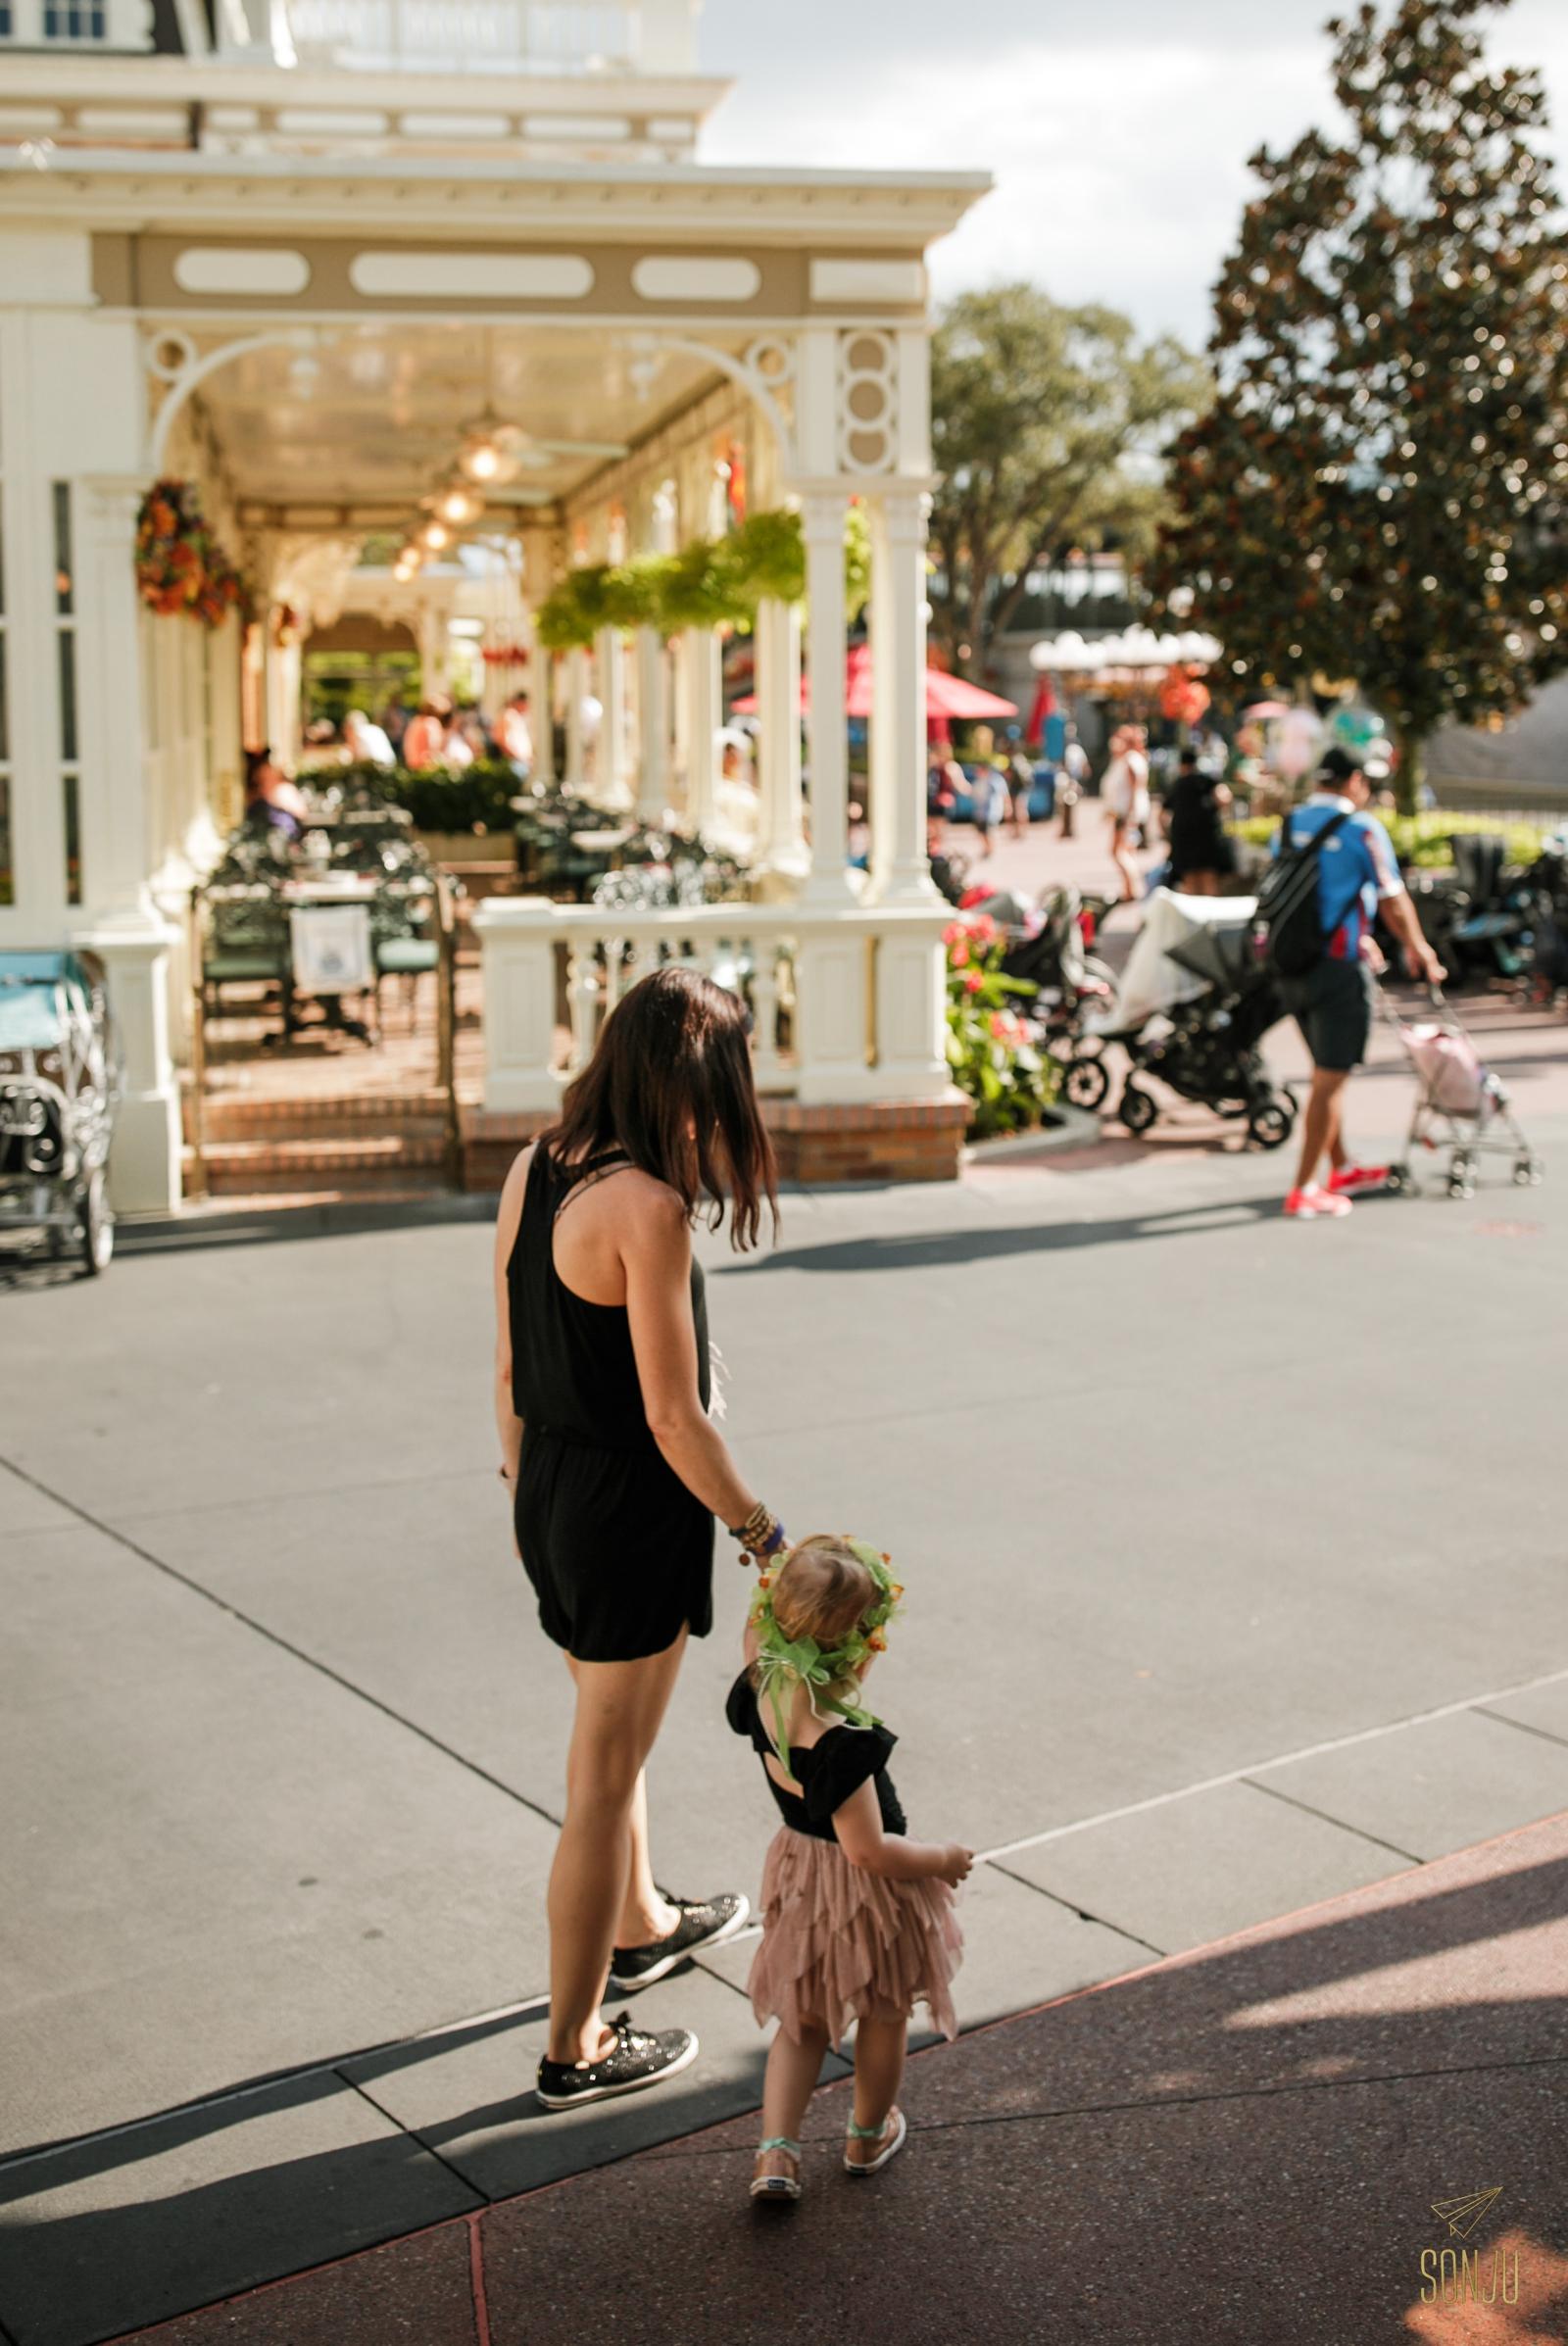 Central-Orlando-Theme-Park-Family-Photography00034.jpg